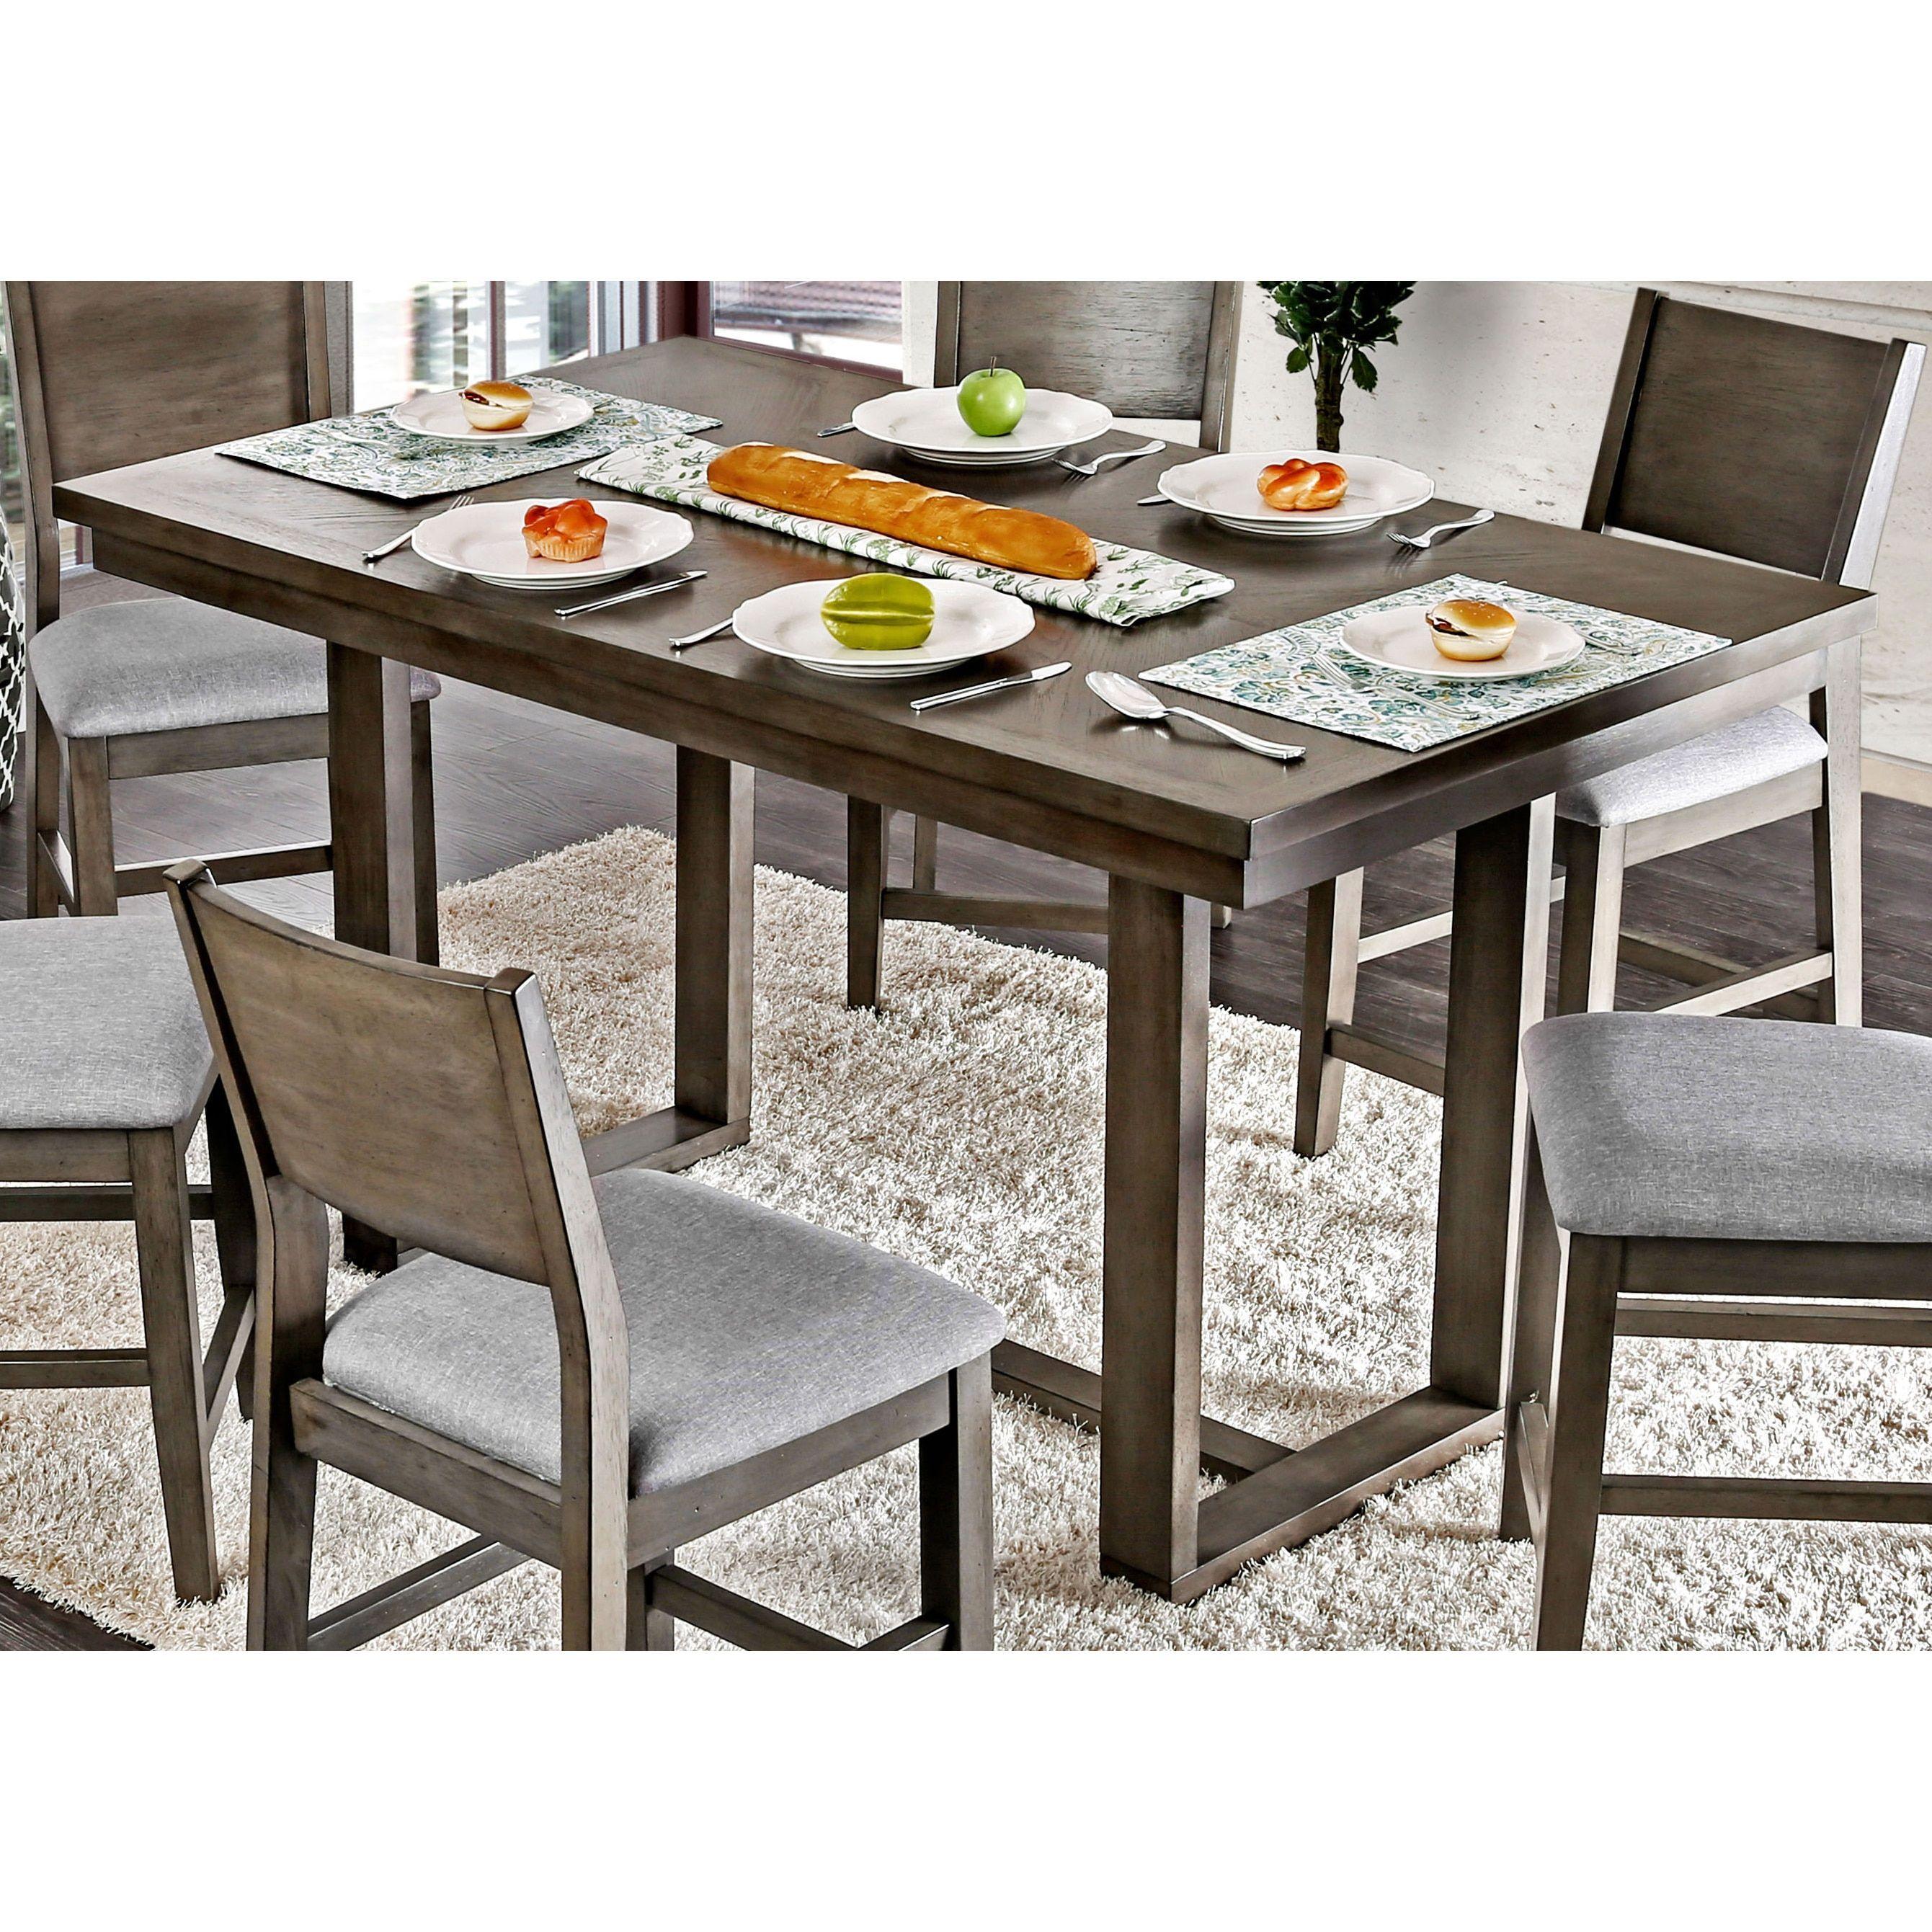 Furniture of america timpton contemporary grey 66 inch counter furniture of america timpton contemporary grey 66 inch counter height table grey watchthetrailerfo